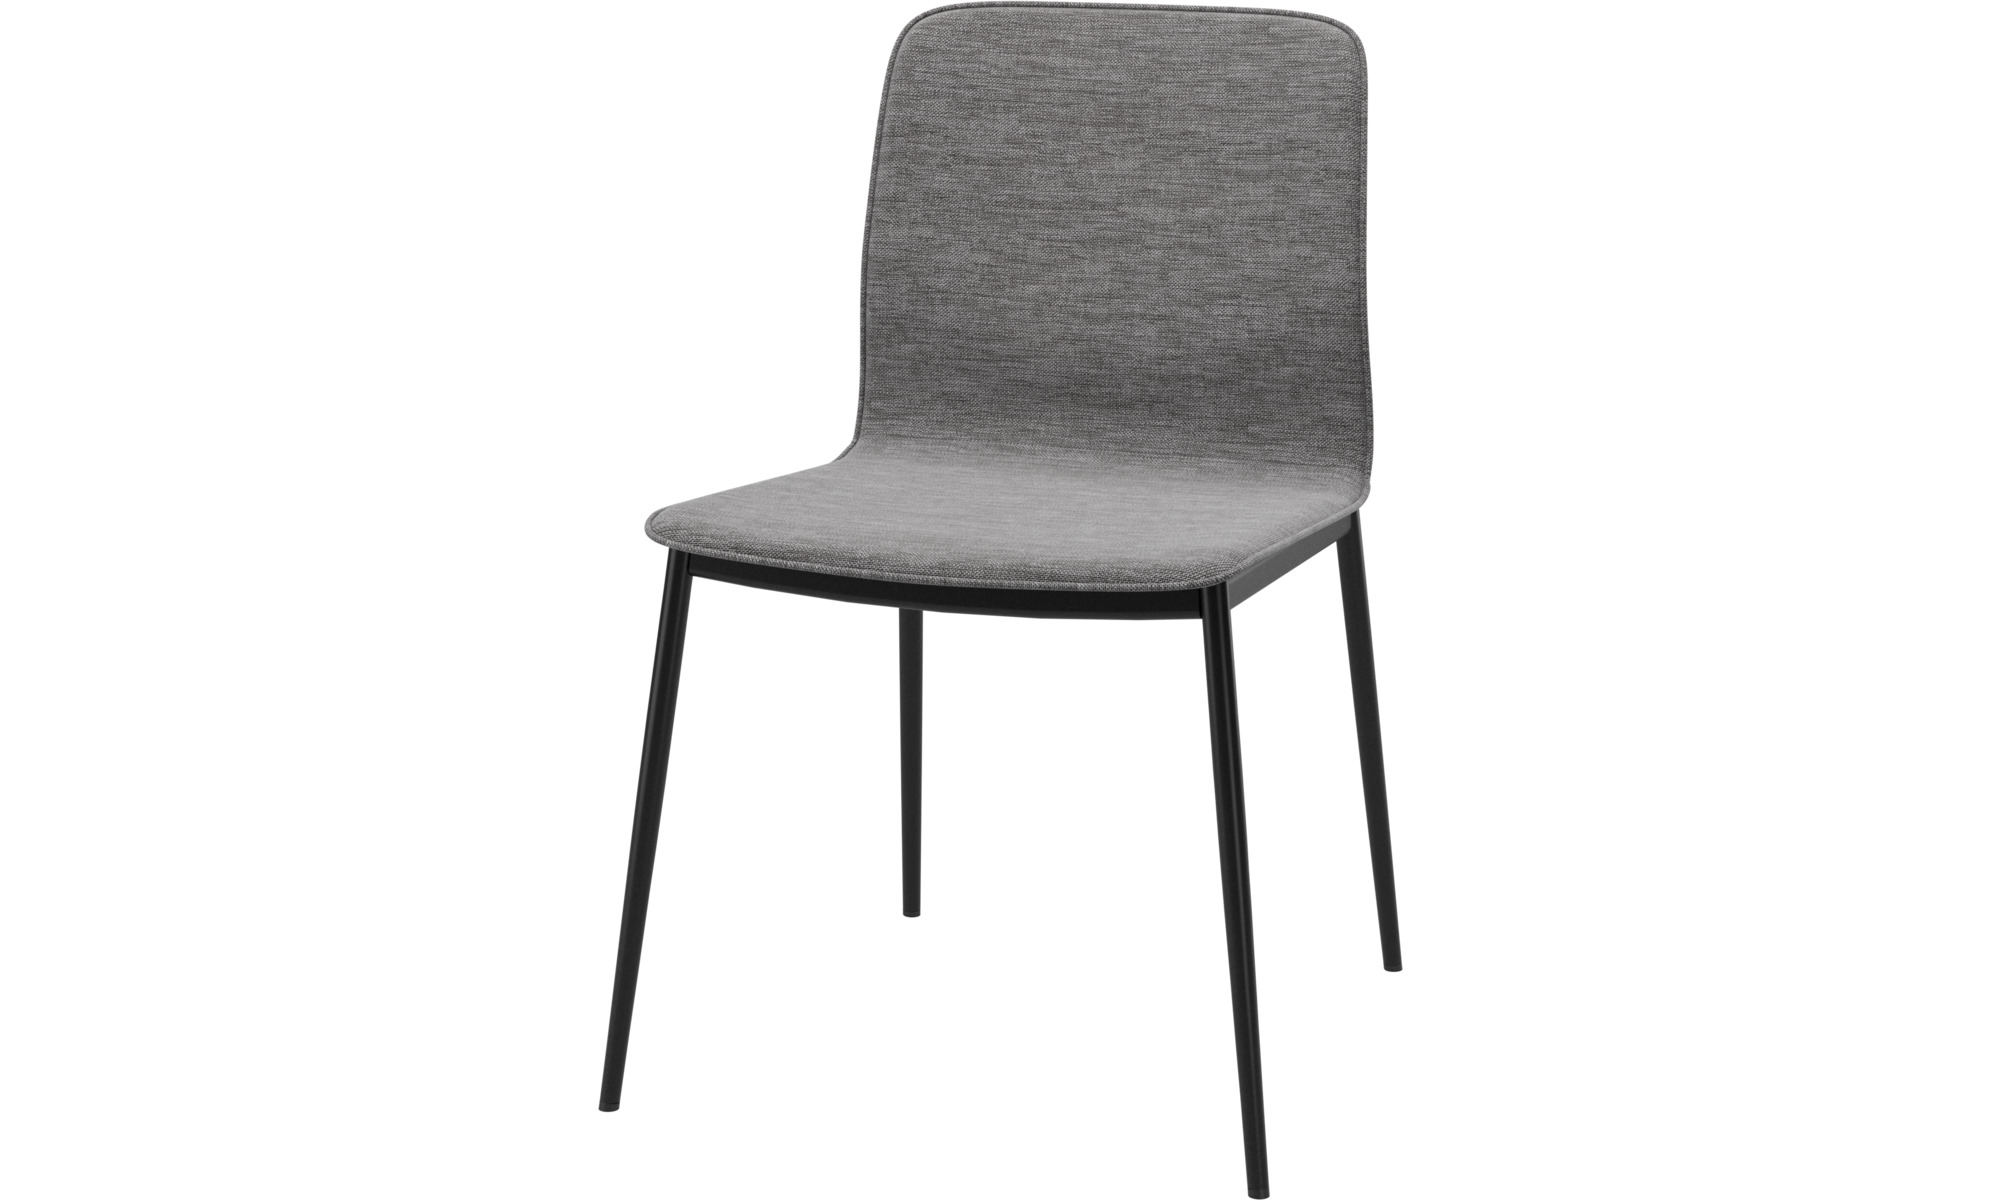 Esszimmerstühle - Newport Stuhl - Grau - Stoff